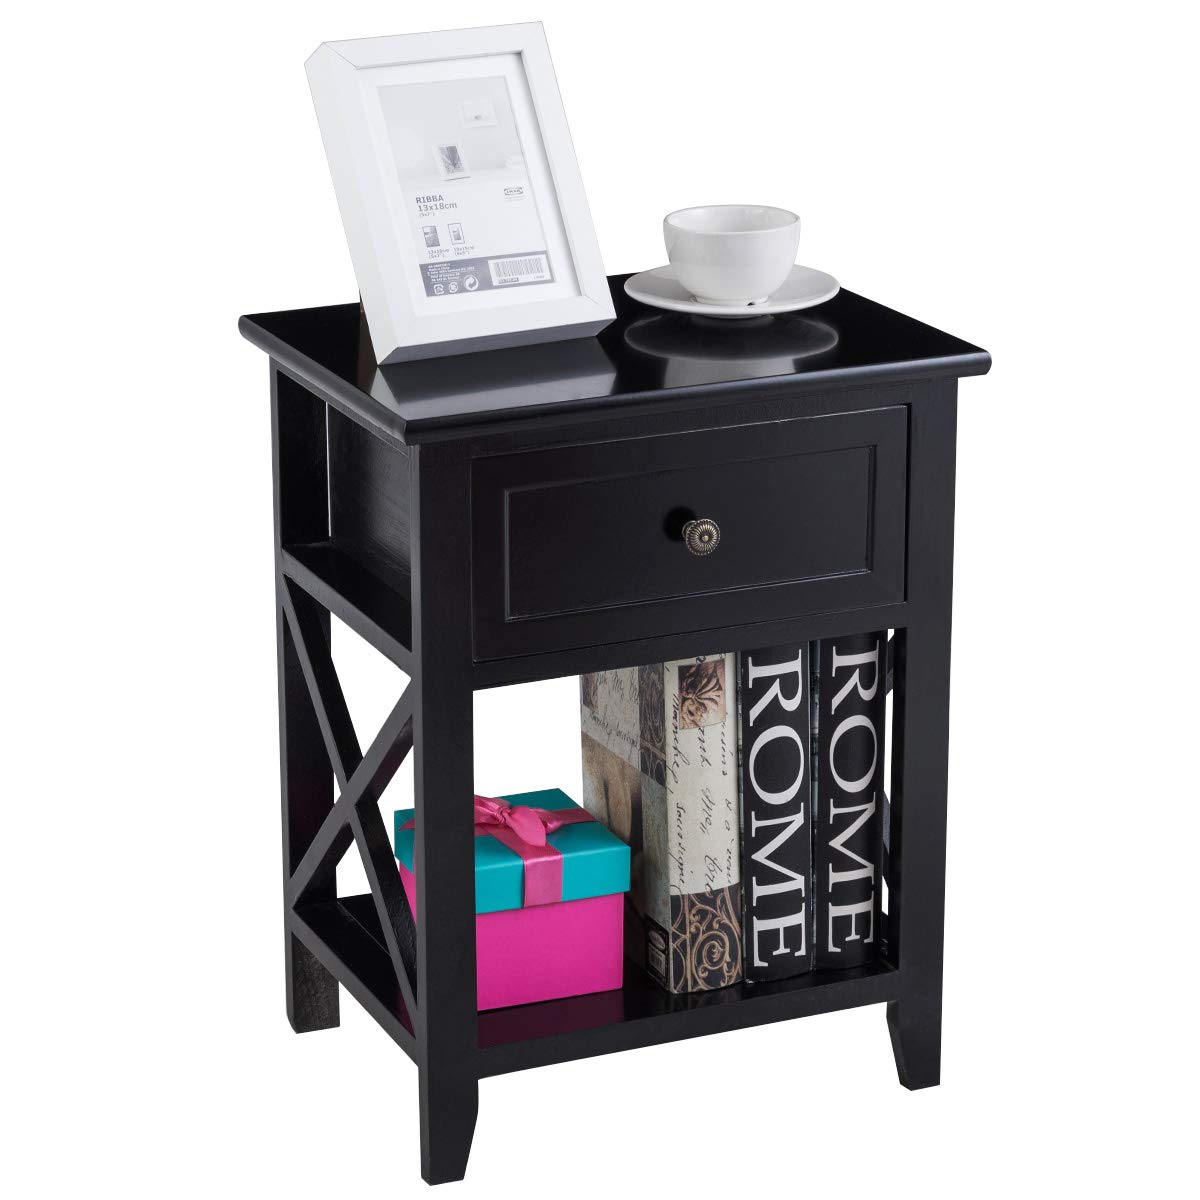 Giantex 2 Pcs Nightstand End Bedside Table Home Bedroom Furniture X-Shape W/Bottom Open Shelf Drawer, Black by Giantex (Image #8)